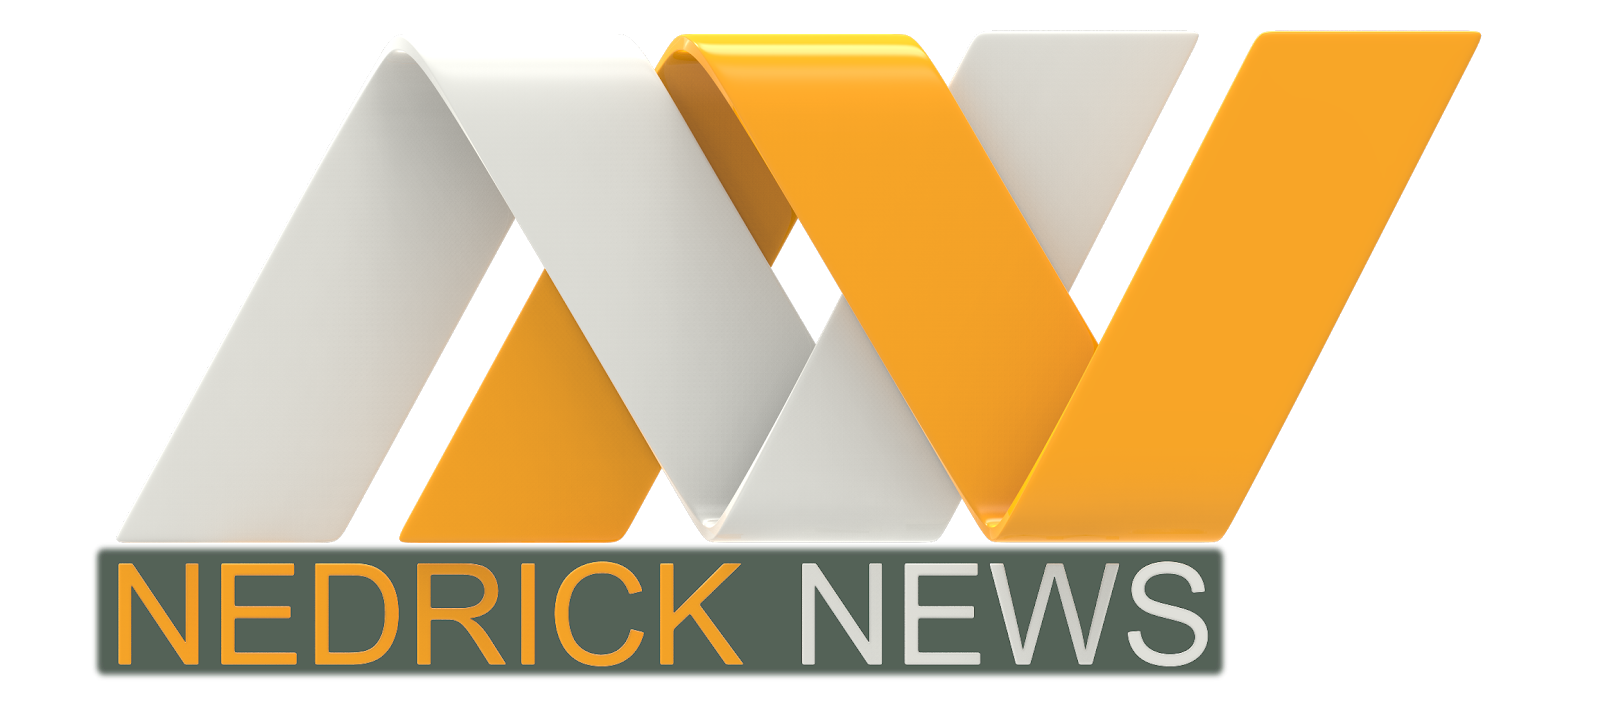 Nedrick News